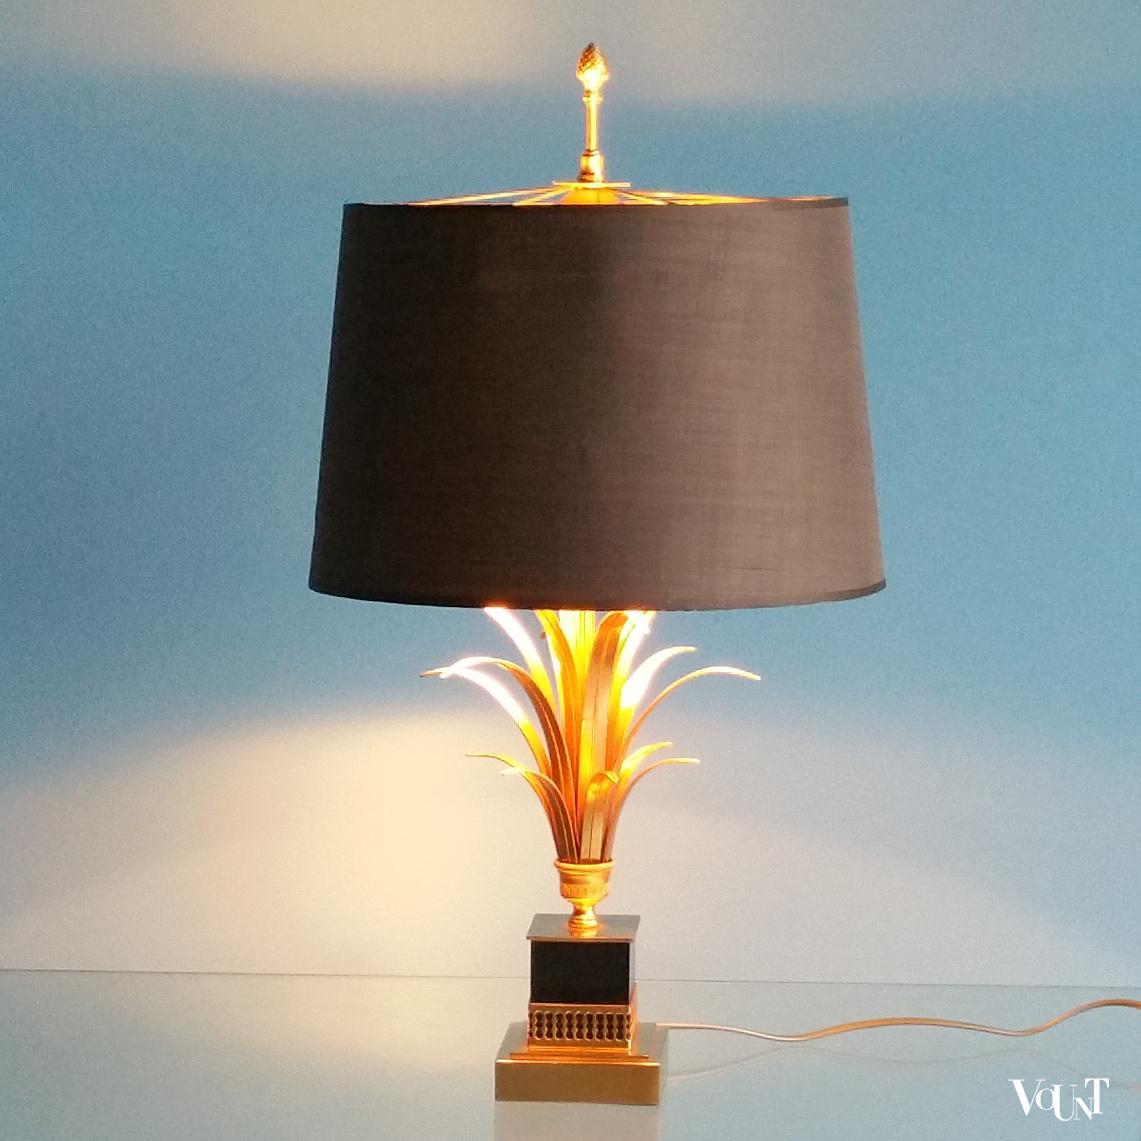 Ananas lamp pineapple leaf lamp, S.A. Boulanger, jaren '70